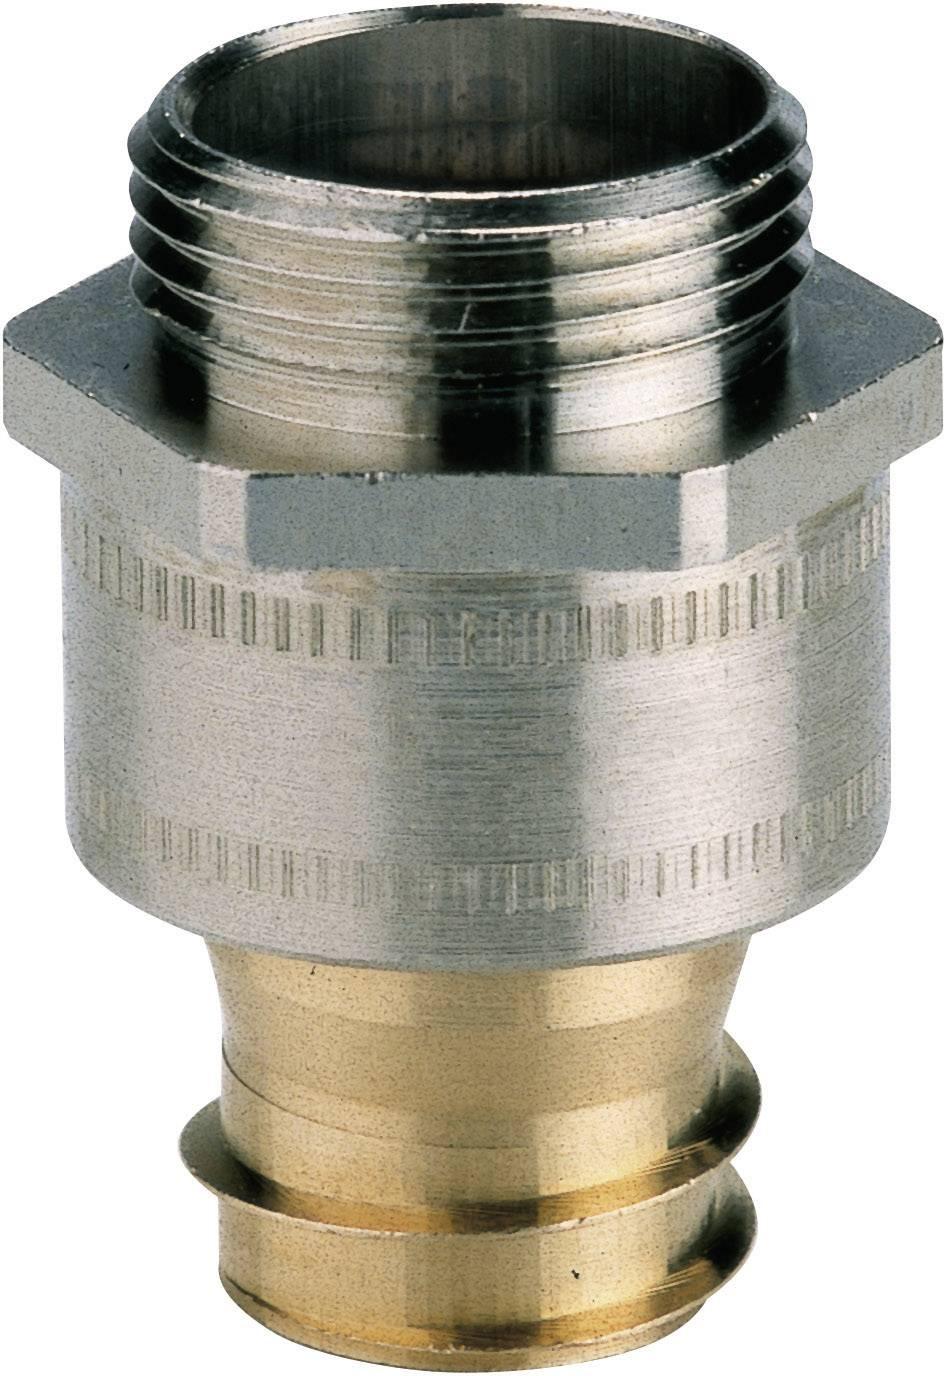 Hadicová spojka rovná LAPP SILVYN® LI-M 12x1,5 SGY 61802370, M12, stříbrná, 1 ks